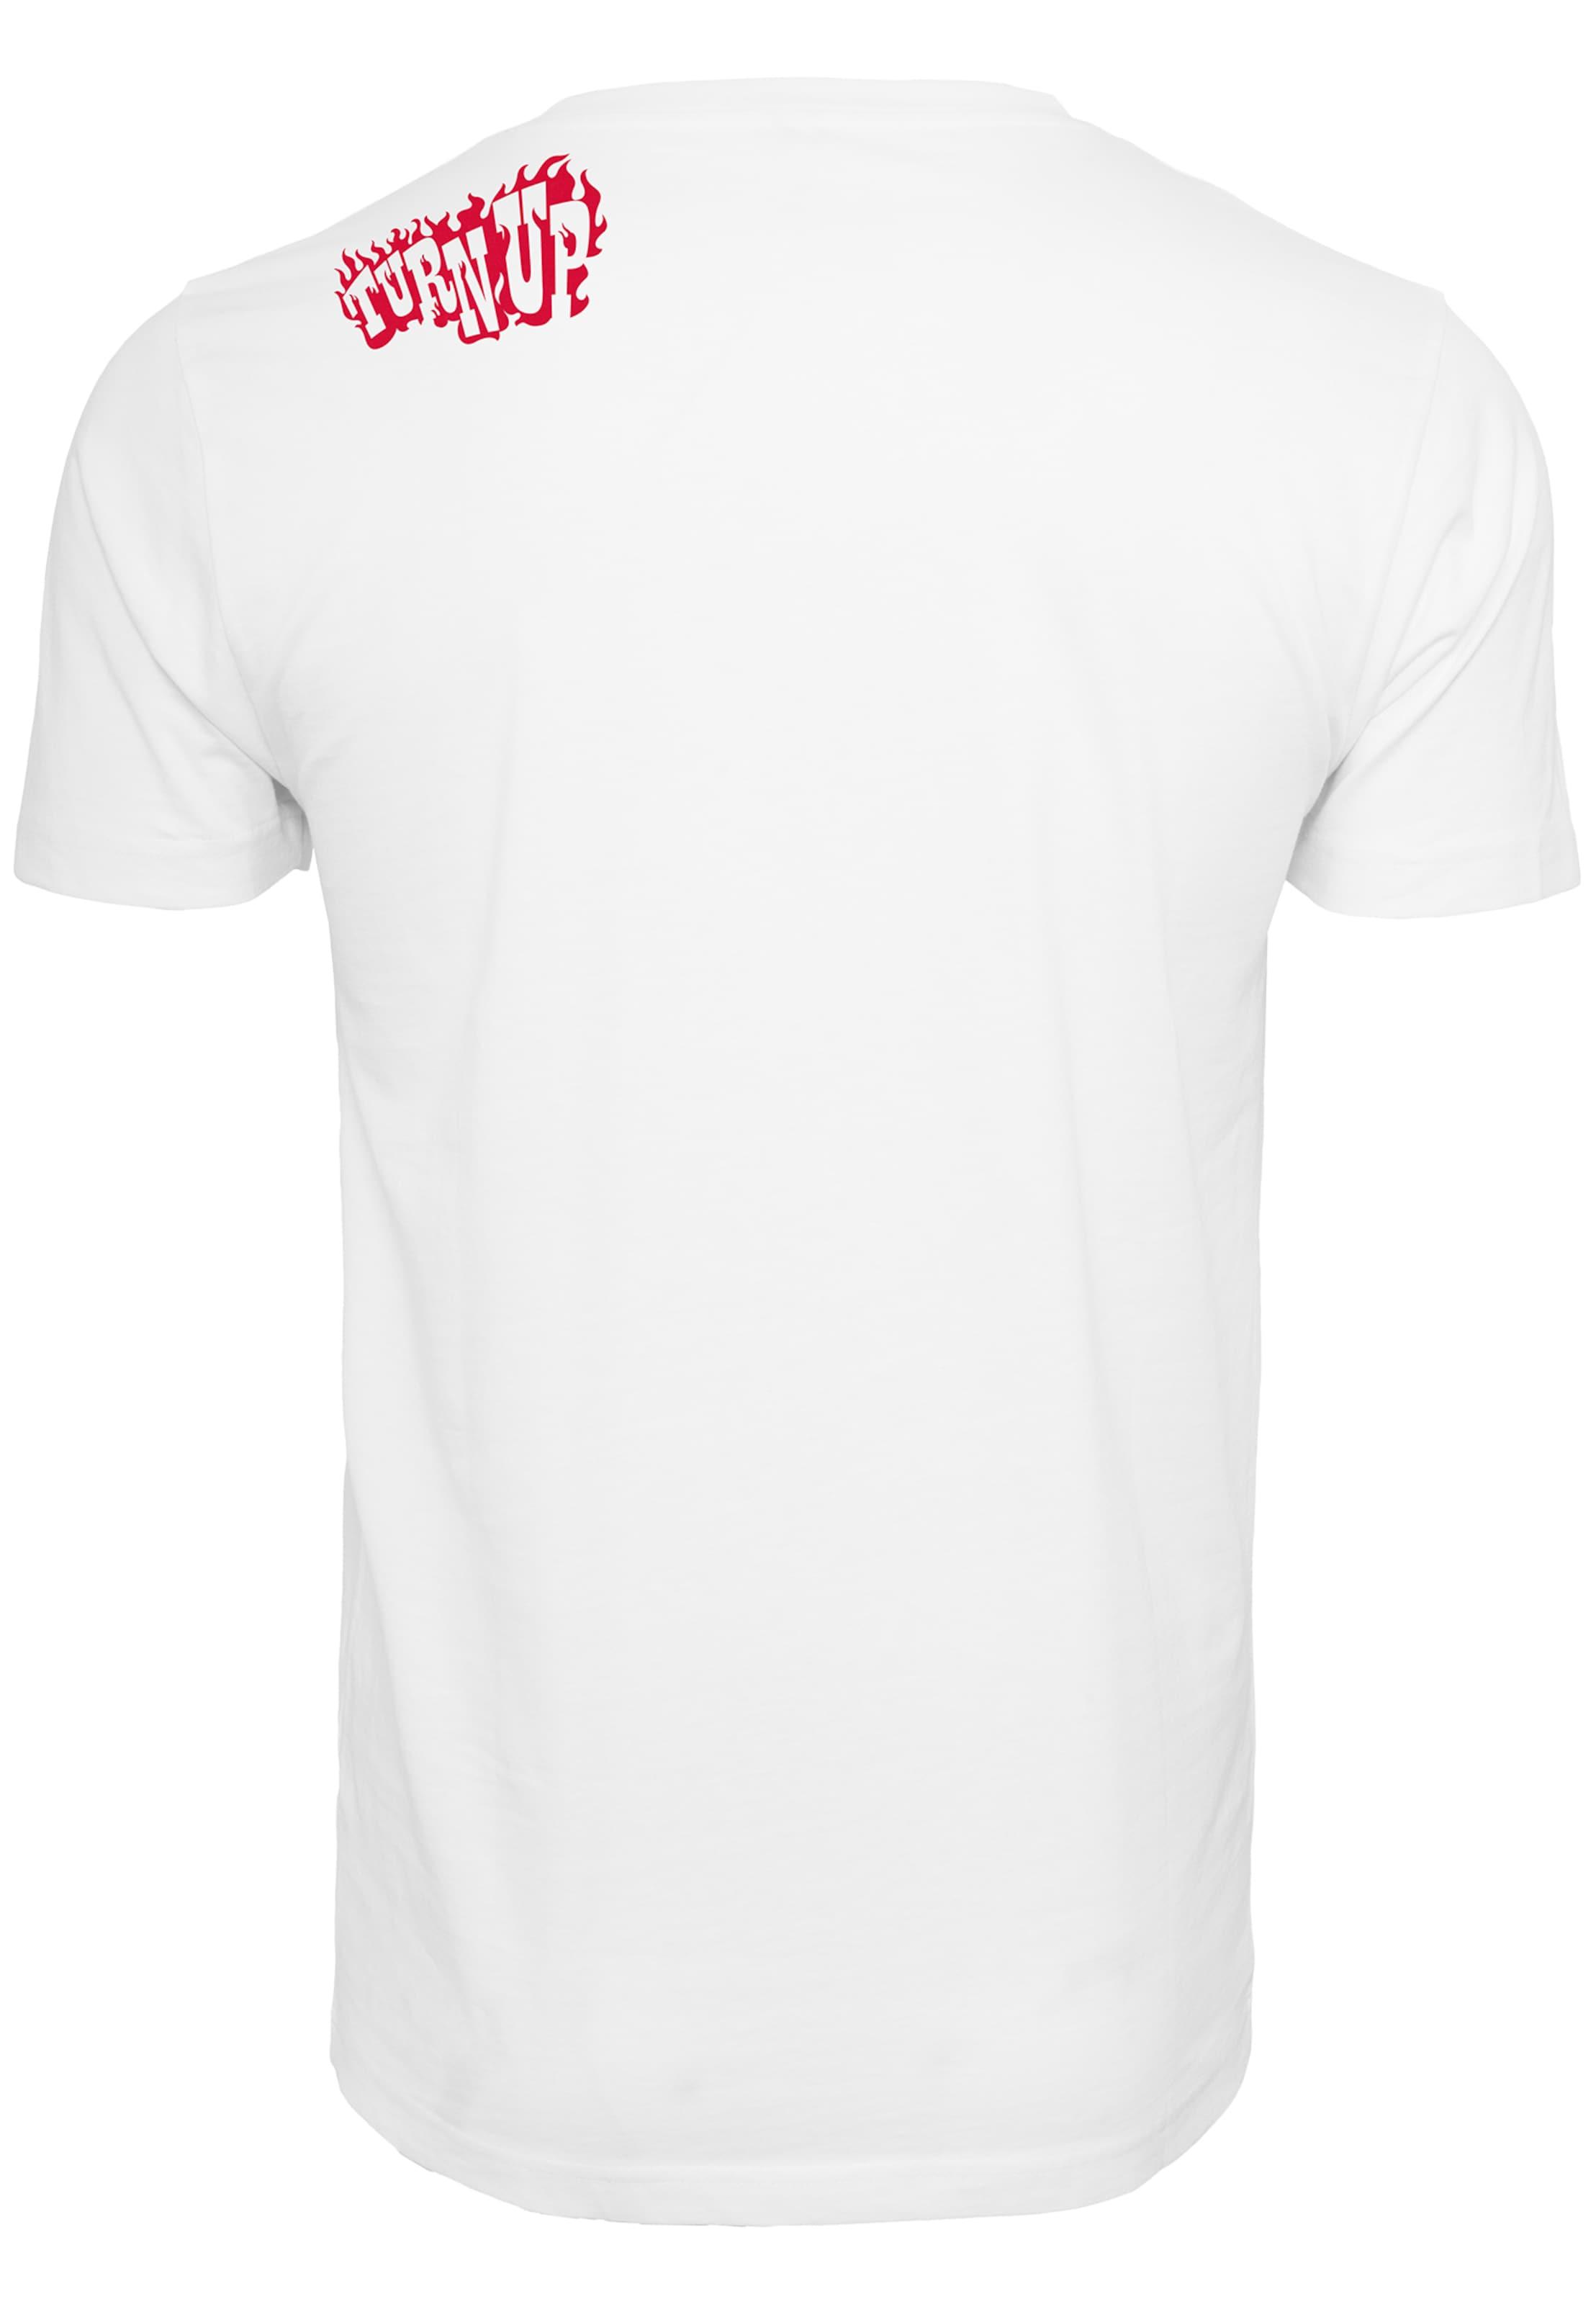 Mister Tee T-Shirt 'Stir Fry Tee' in rot / weiß Baumwolle TU079-00220-0042